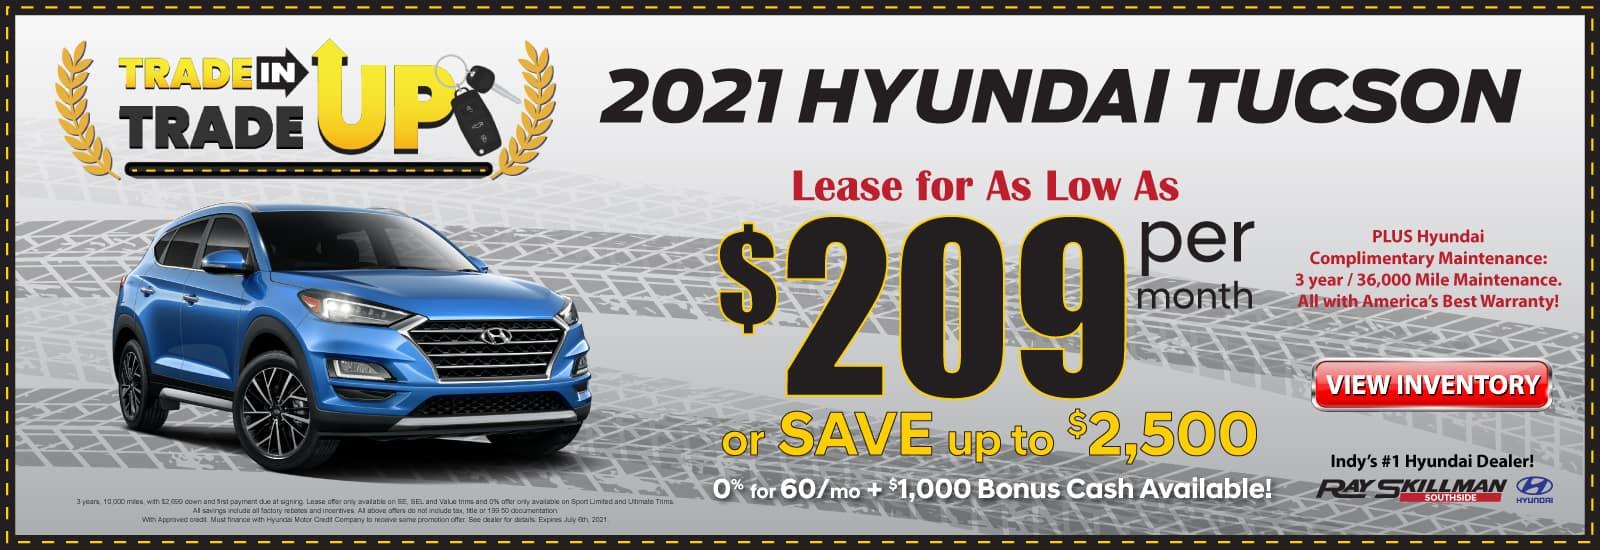 2021-Hyundai-Tucson-Web-Banner-June